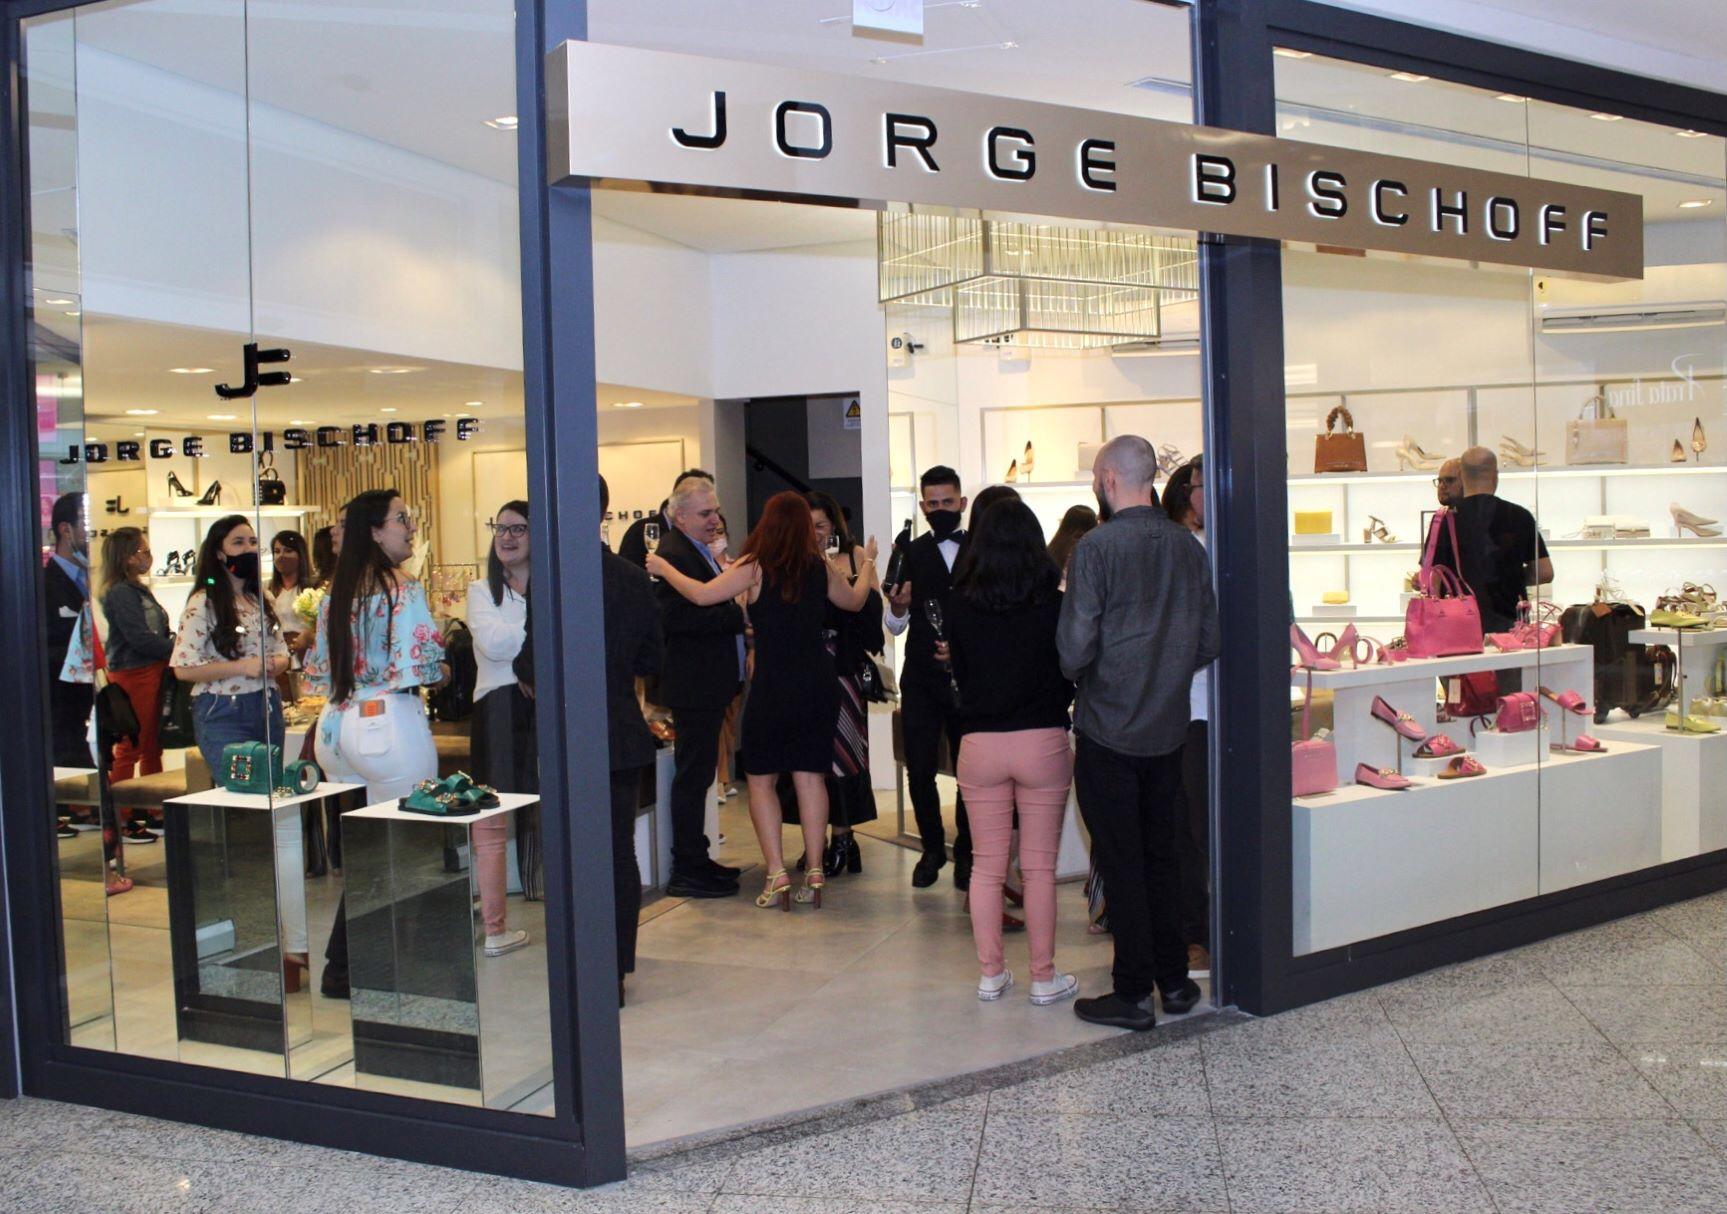 Itajaí Shopping recebe loja exclusiva da grife Jorge Bischoff